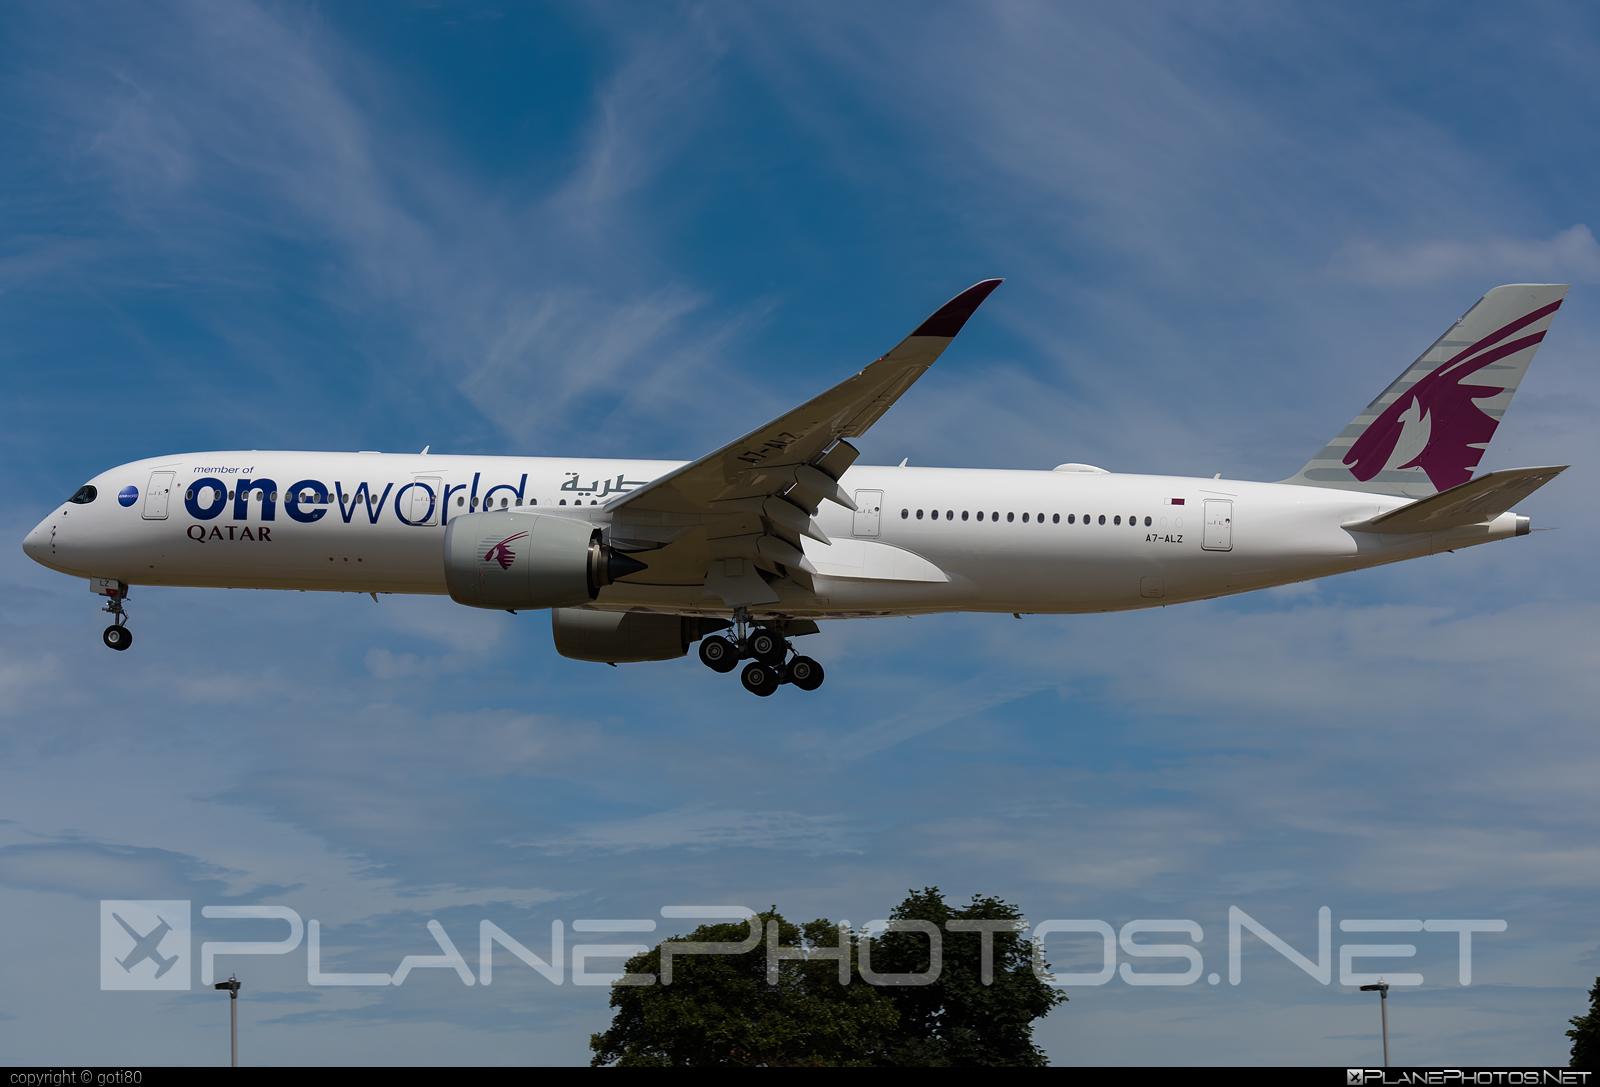 Airbus A350-941 - A7-ALZ operated by Qatar Airways #a350 #a350family #airbus #airbus350 #oneworld #qatarairways #xwb